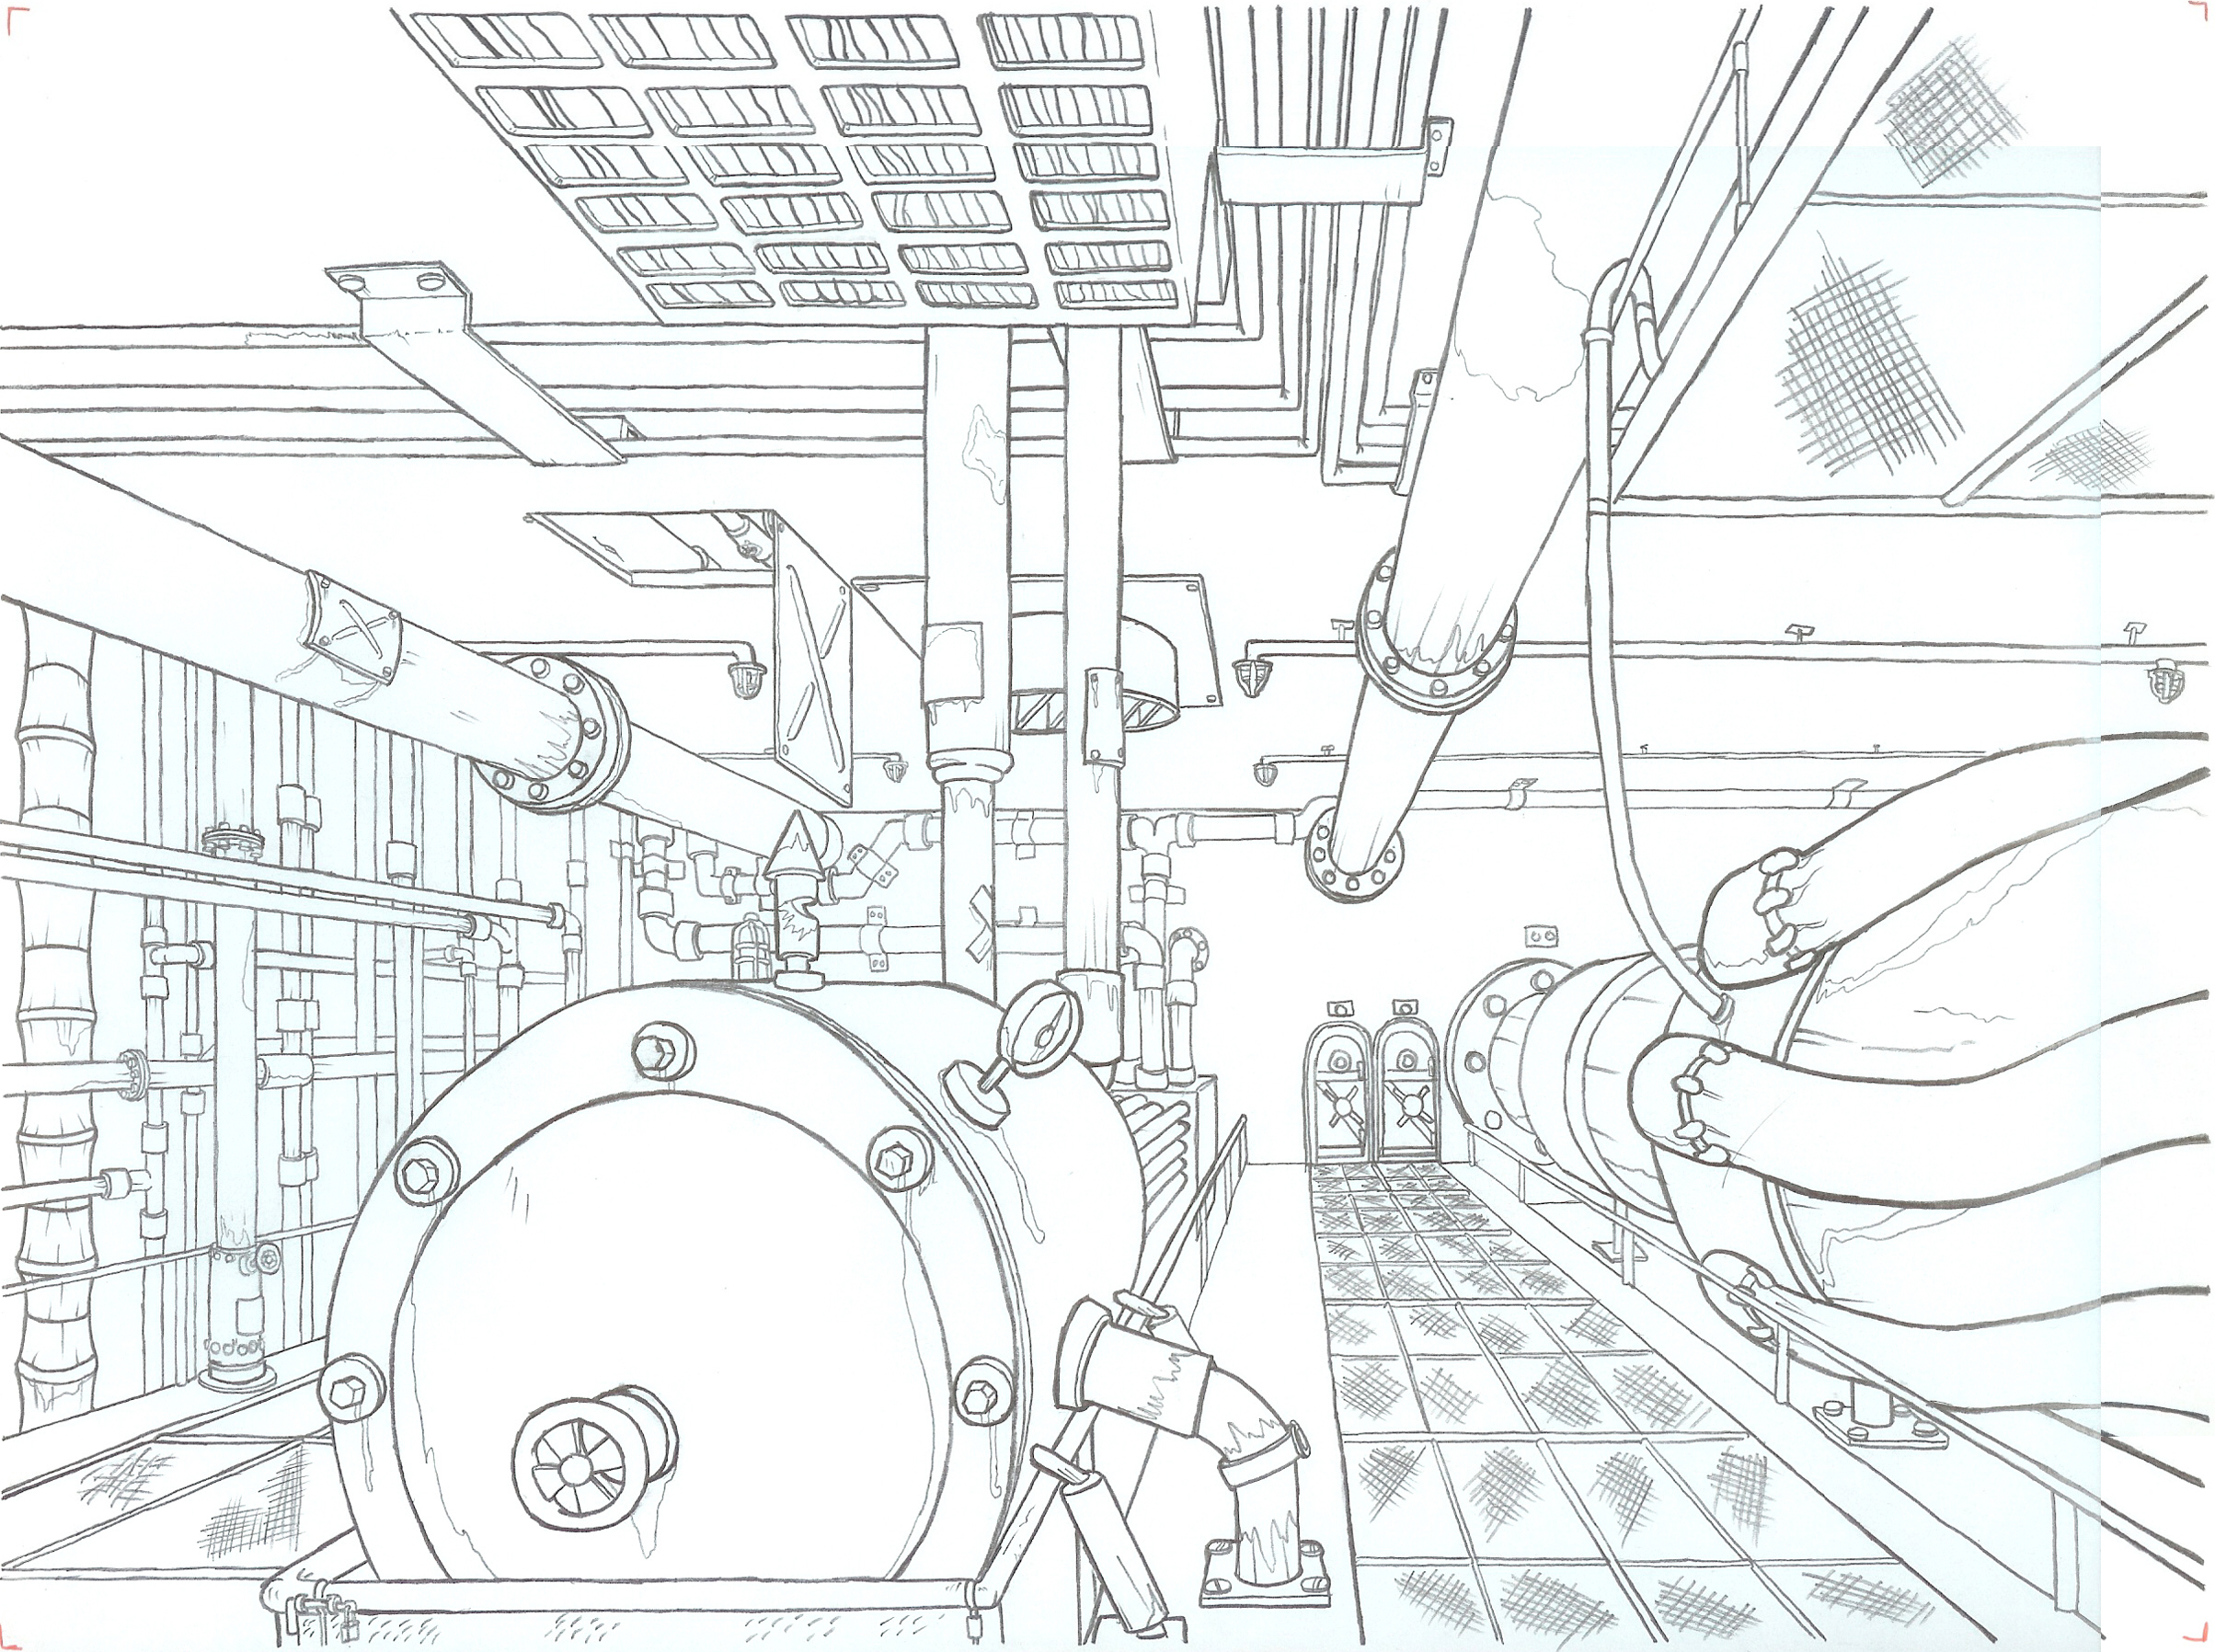 Ship Engine Room by Marasai on DeviantArt